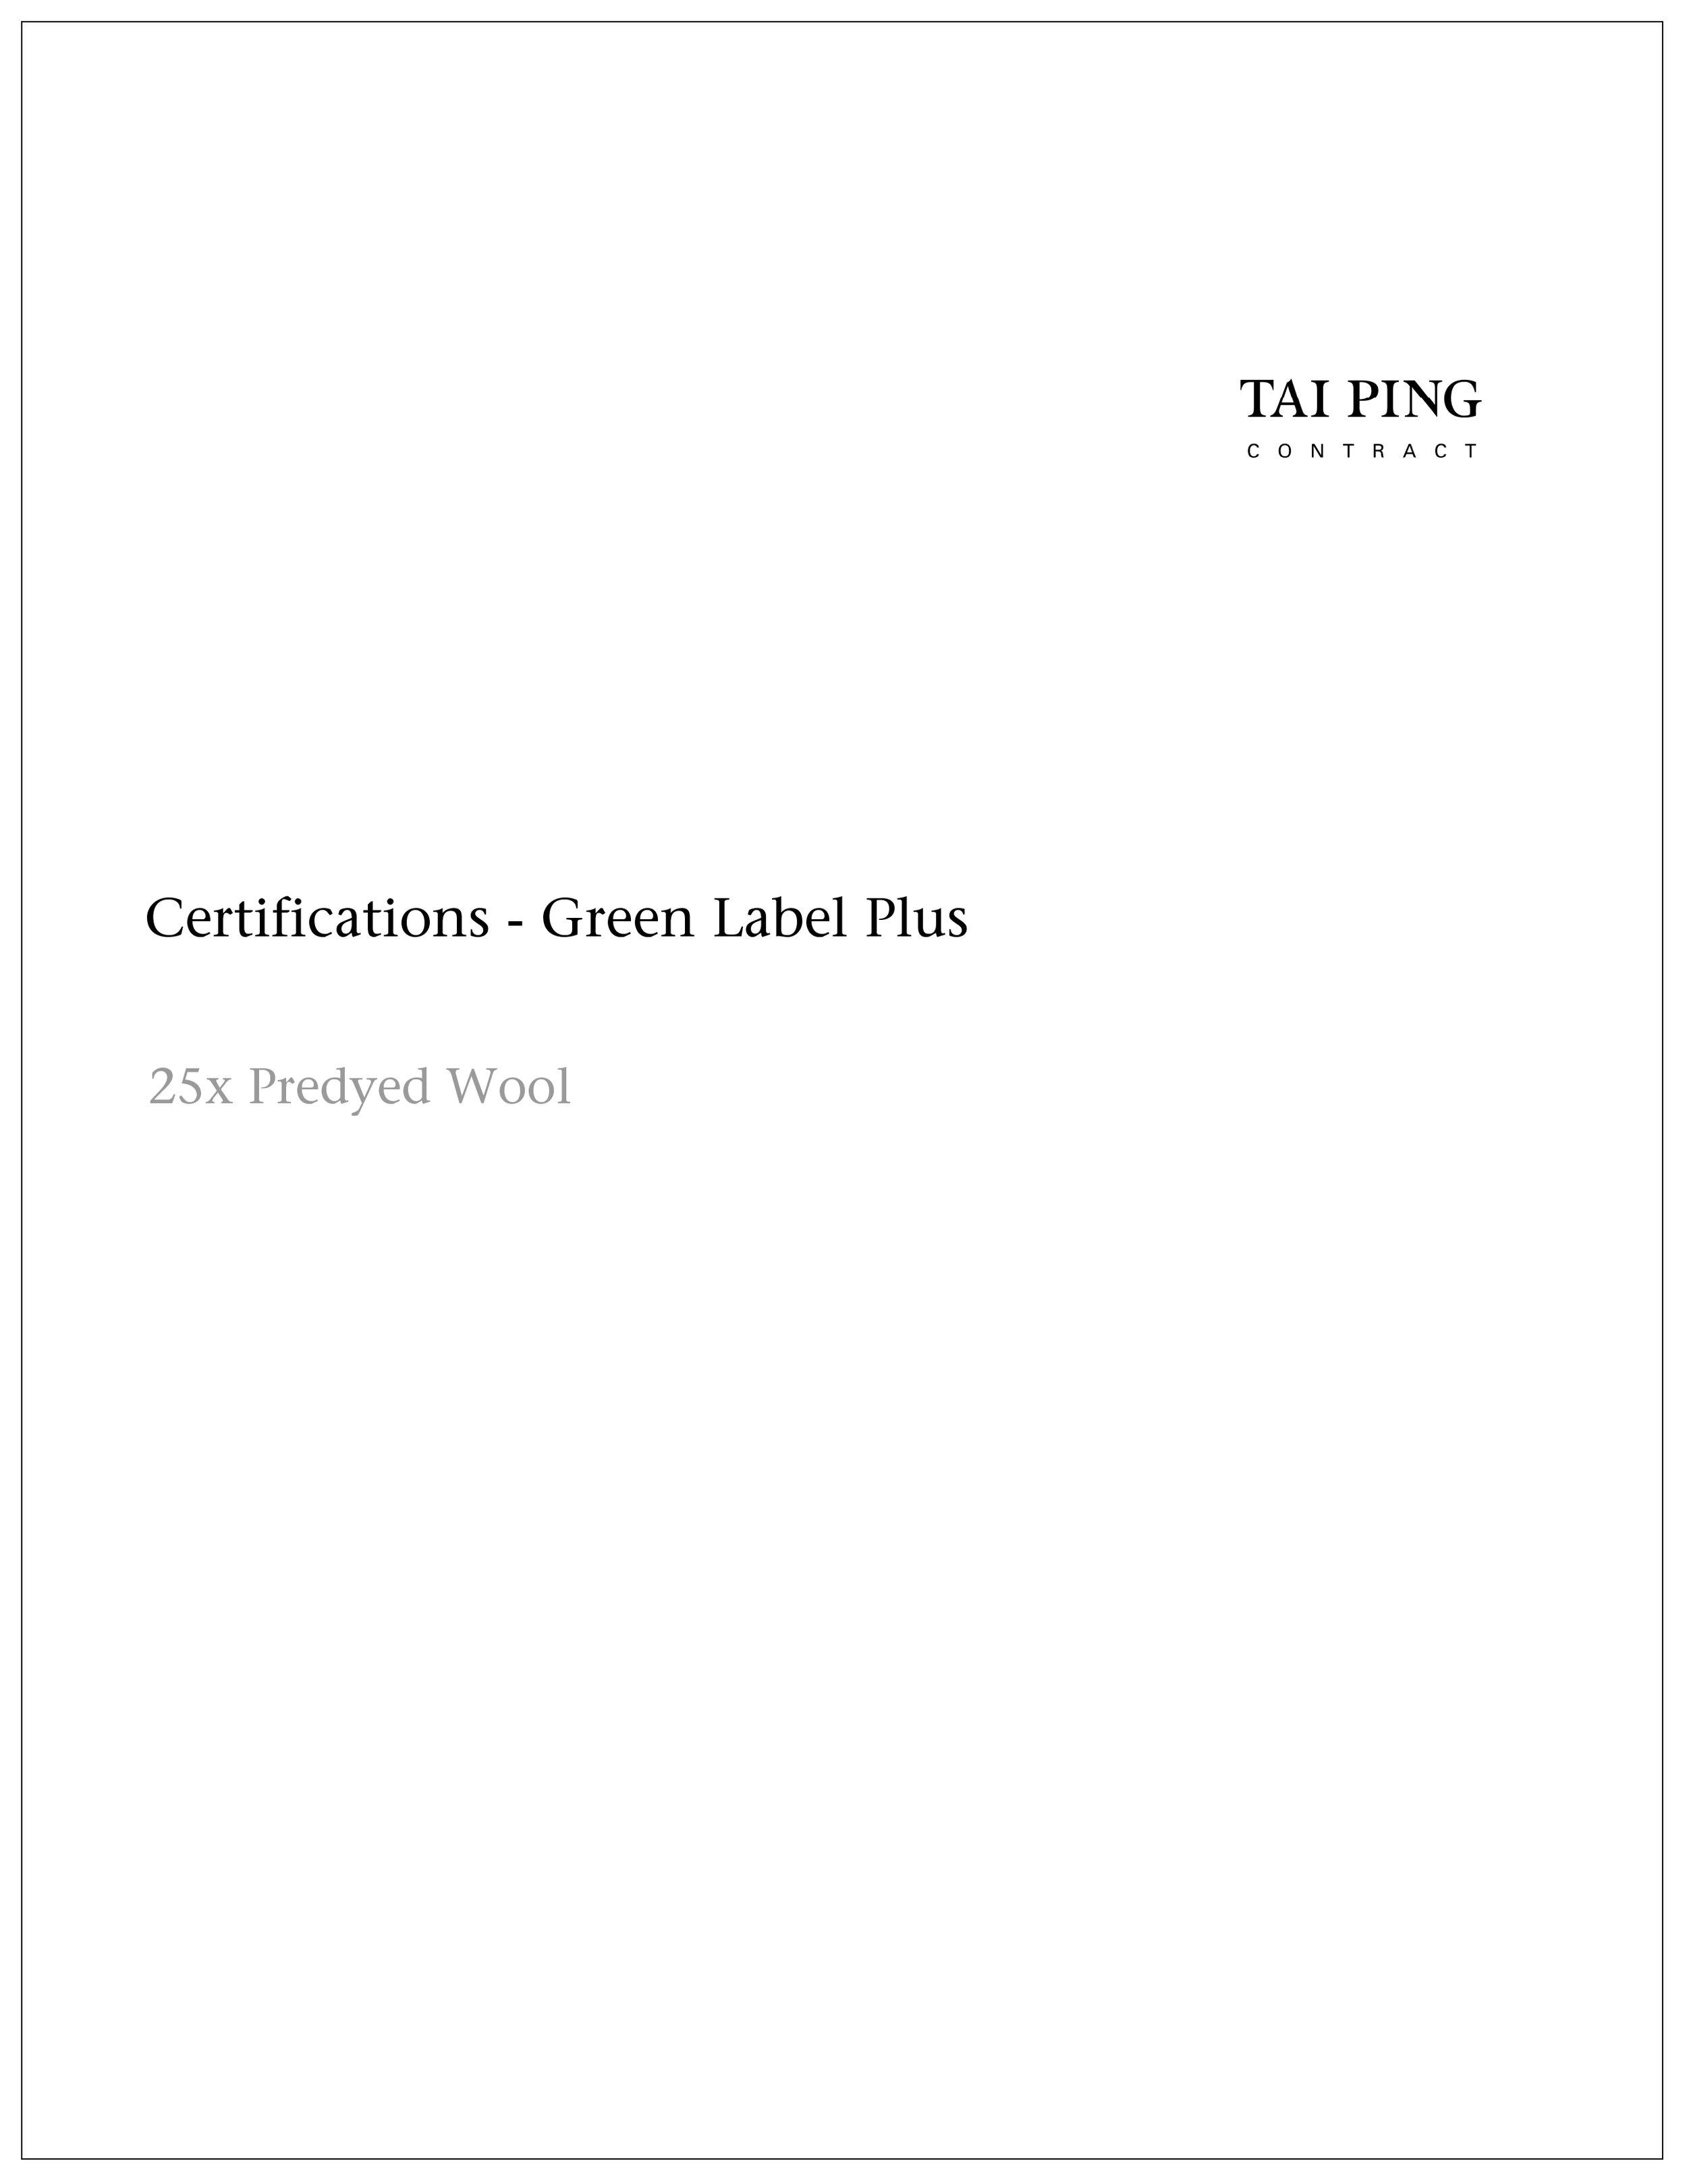 Green Label Plus - Wool